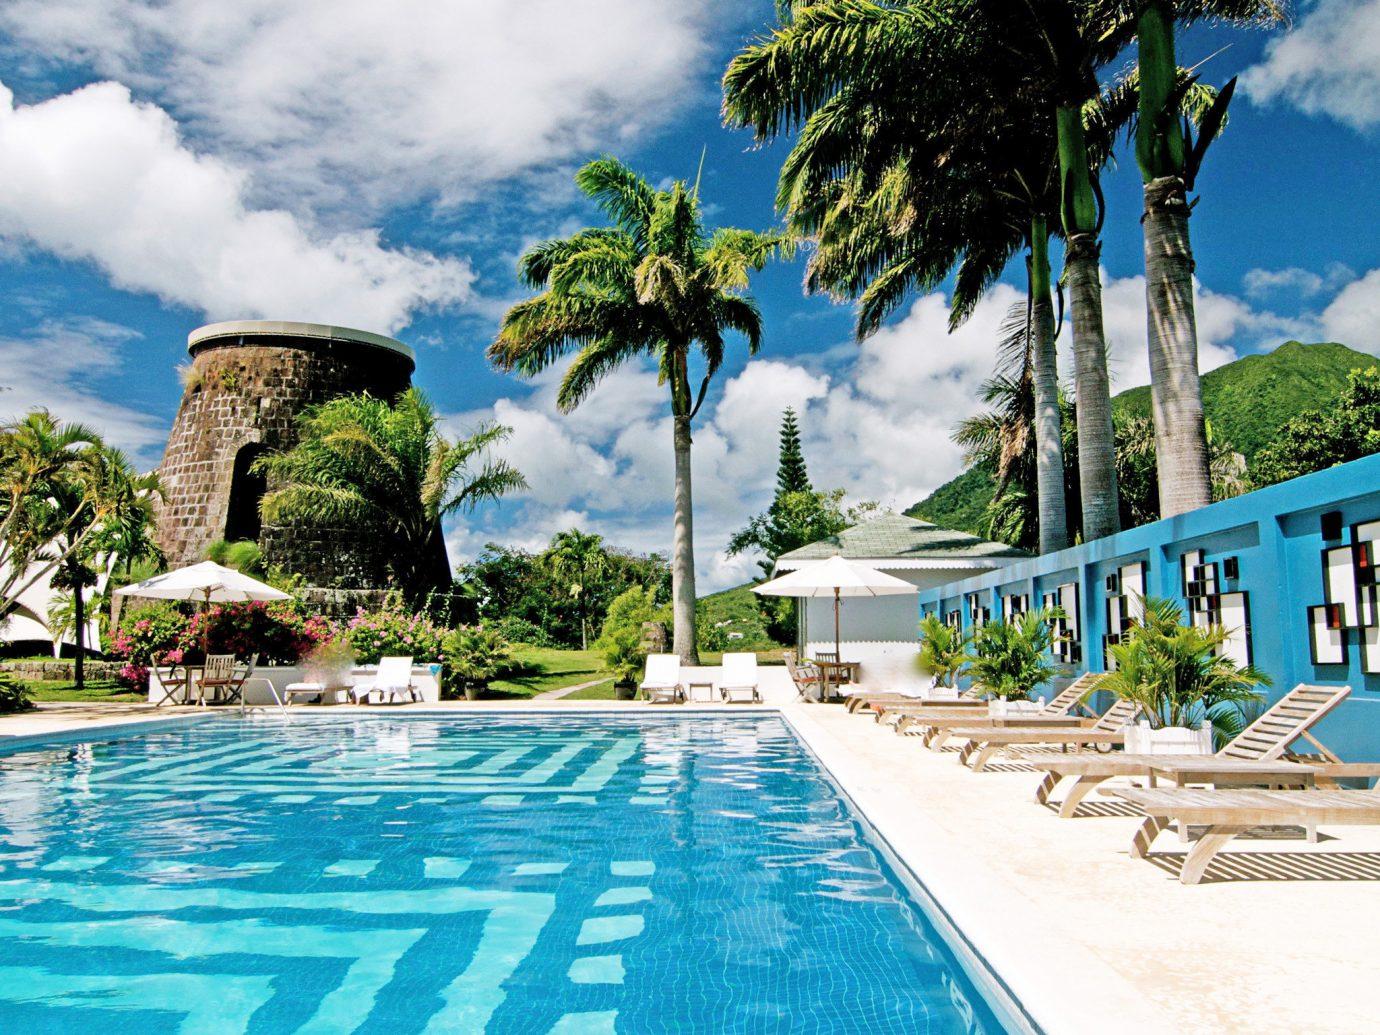 Island Landmarks Pool Trip Ideas tree outdoor sky swimming pool leisure Beach vacation caribbean Sea Ocean Resort arecales Coast tropics bay estate Lagoon walkway day